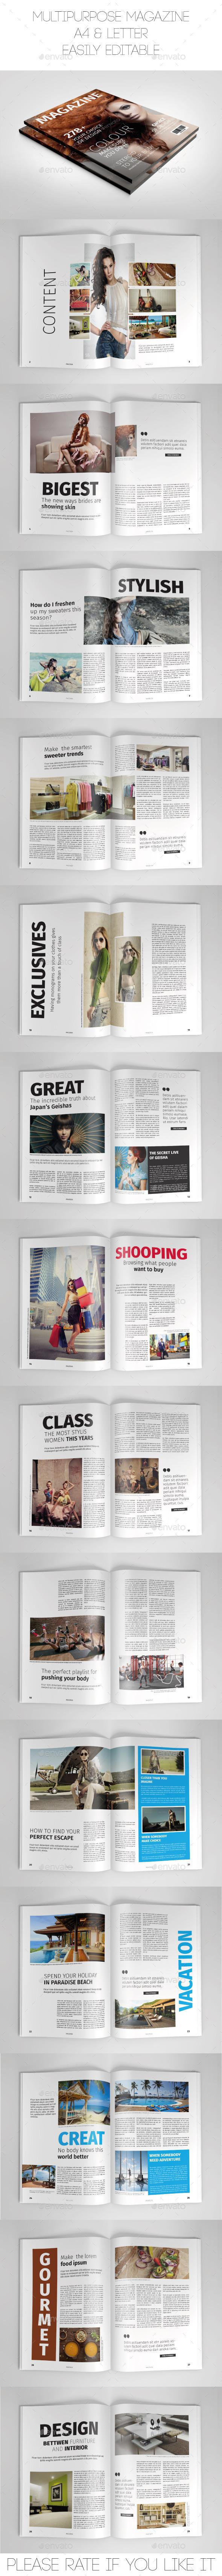 GraphicRiver Multipurpose Magazine 9270263